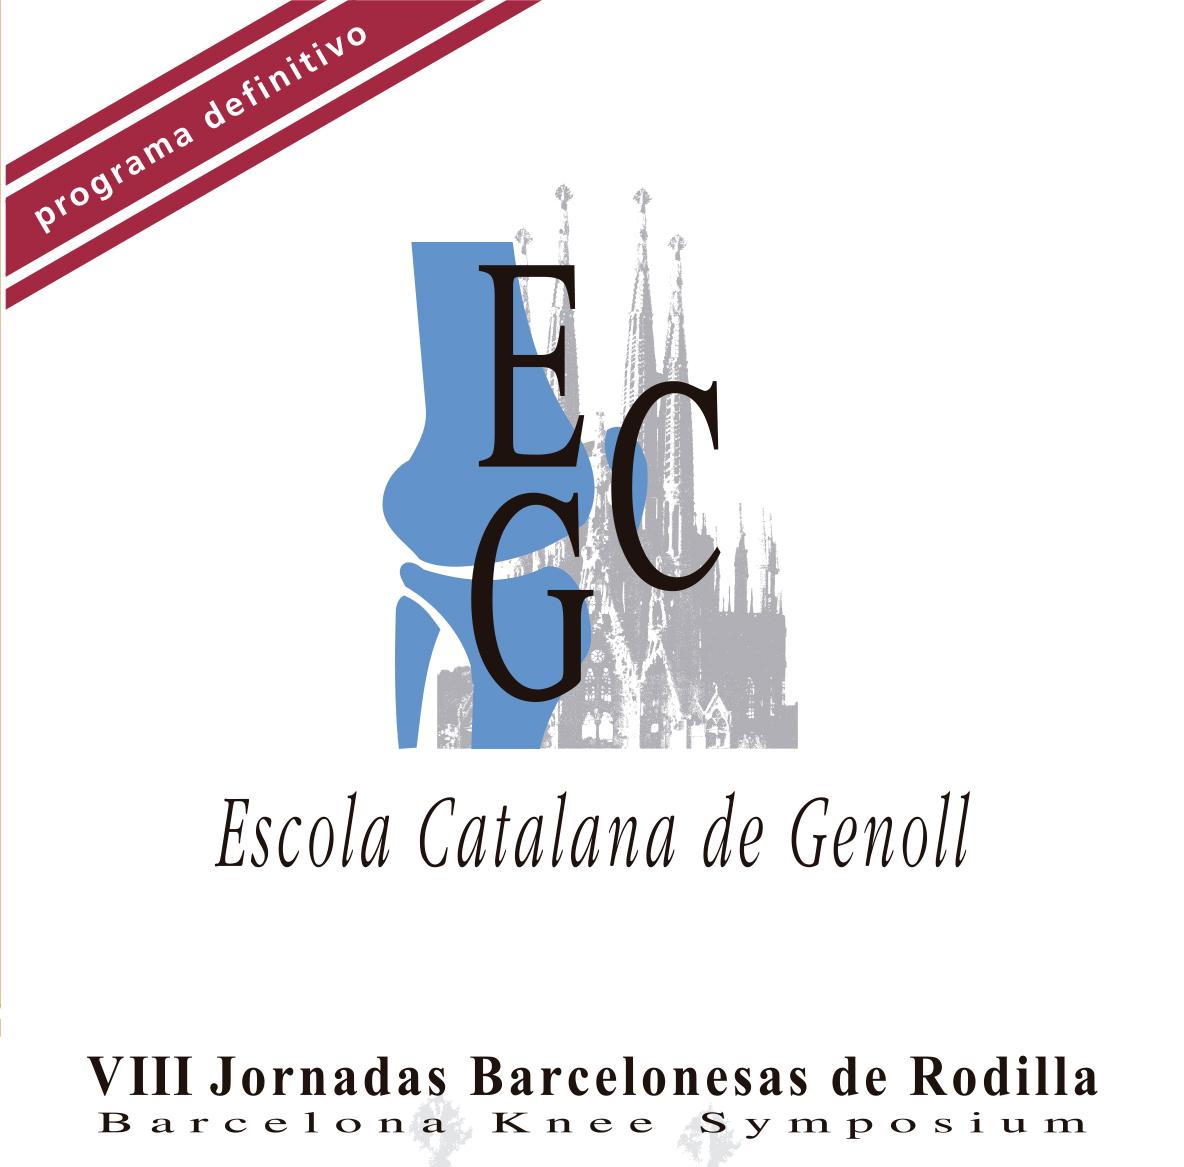 VIIIJornadasBarcelonesasdeRodilla_ECG2010-1